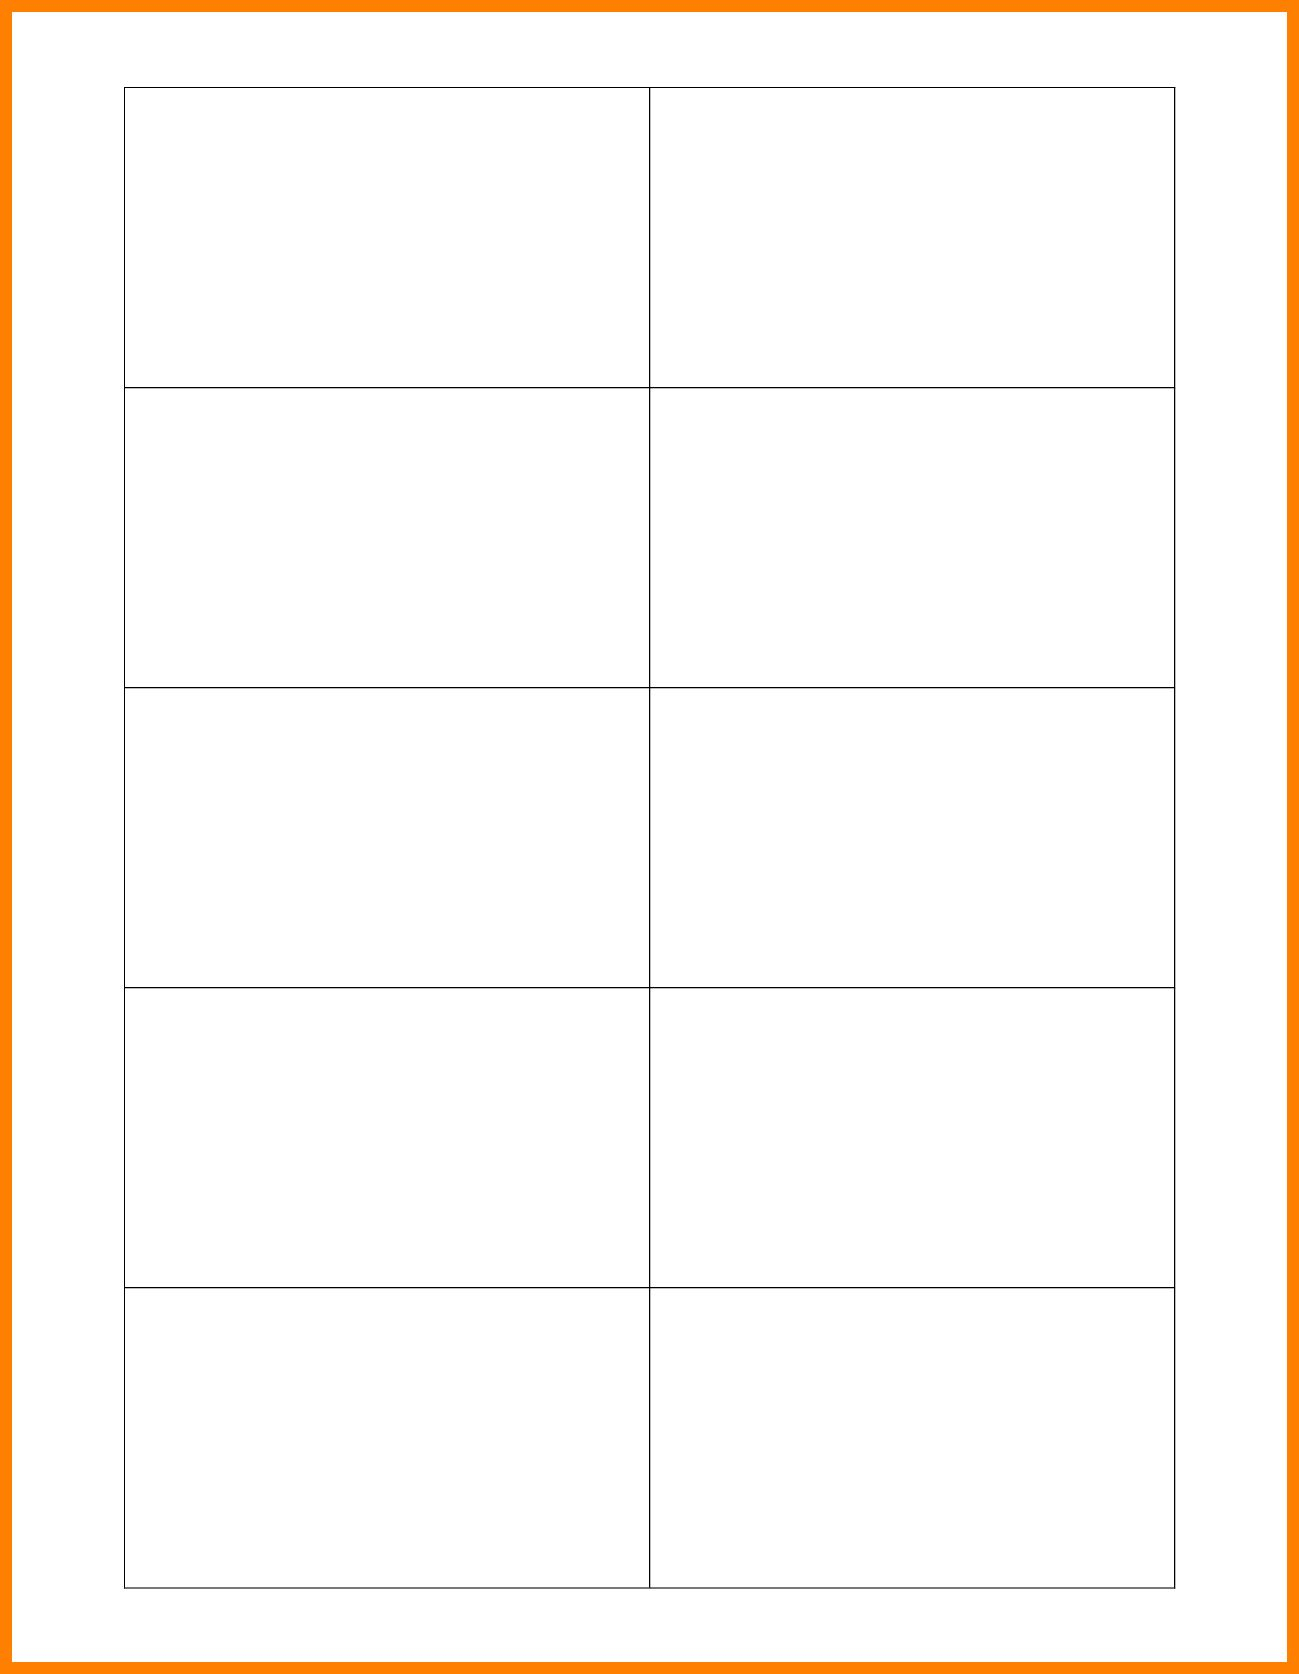 Pinanggunstore On Business Cards Regarding Free Blank Business Card Template Word